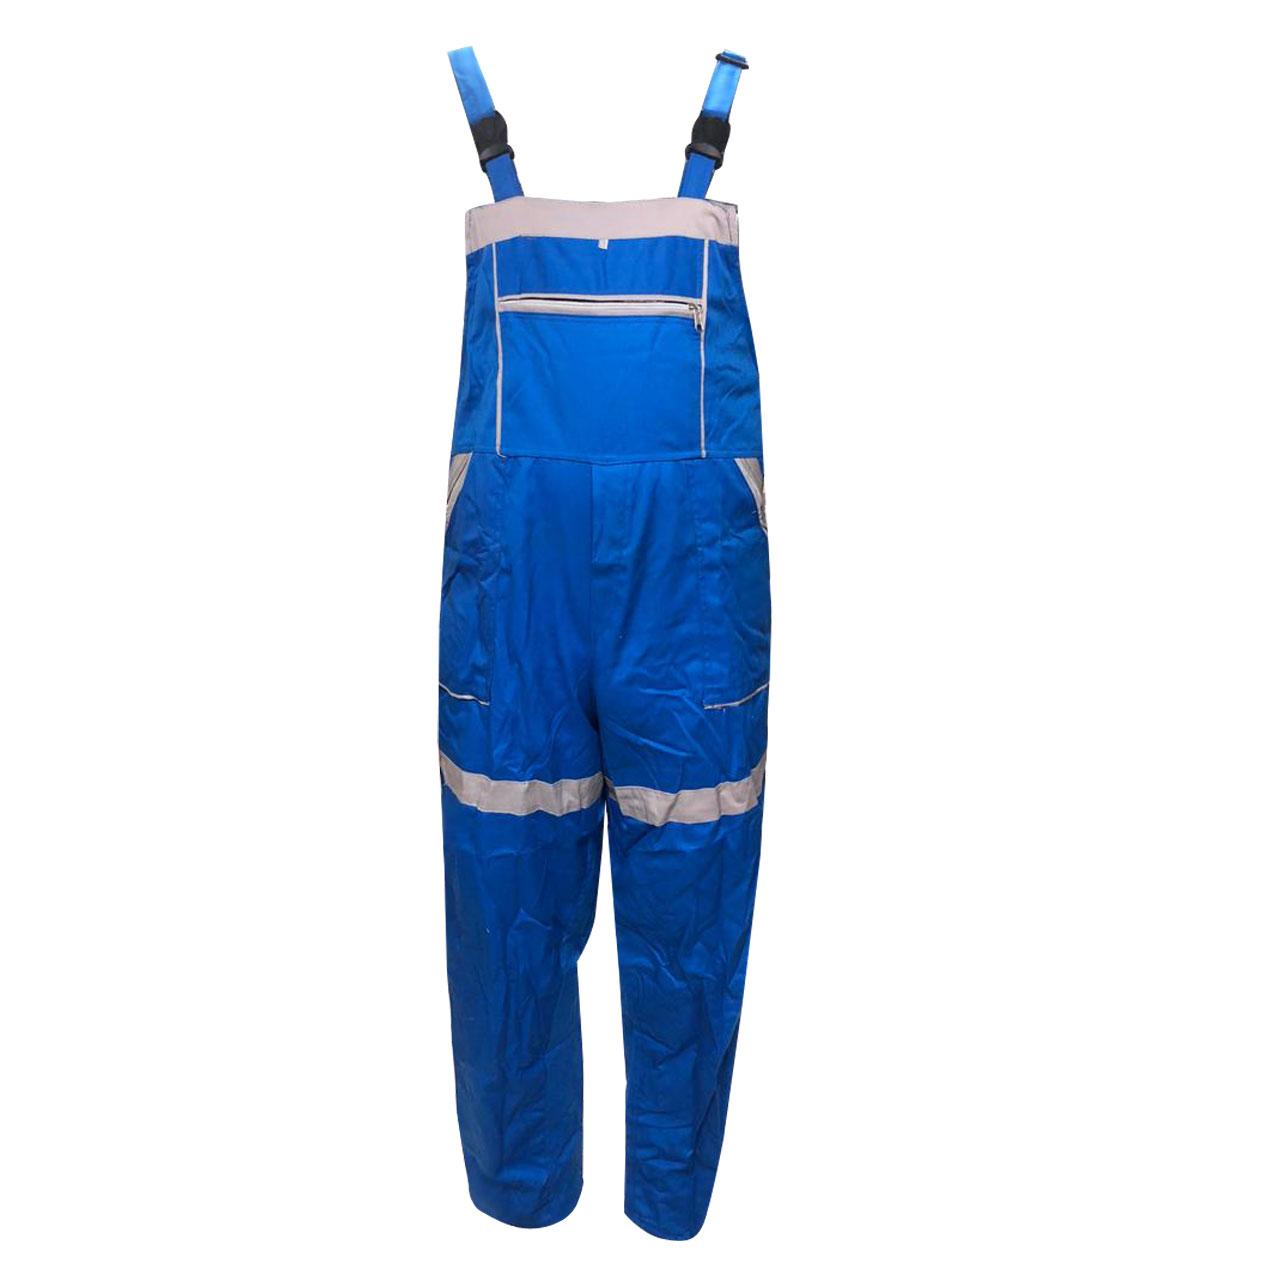 لباس کار مدل IGD-5 رنگ آبی